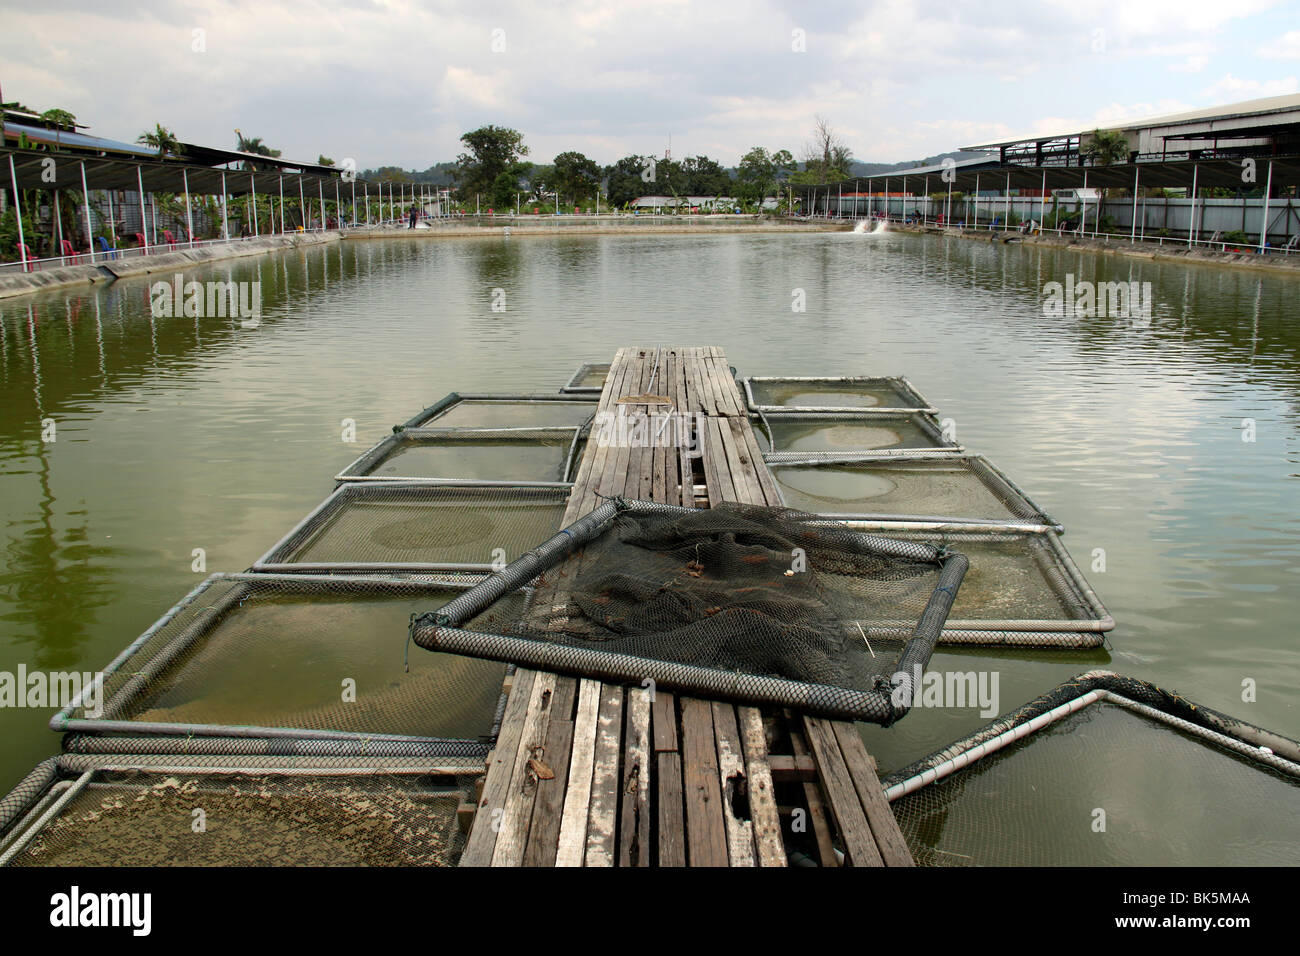 An inland aquaculture fishery farm. - Stock Image